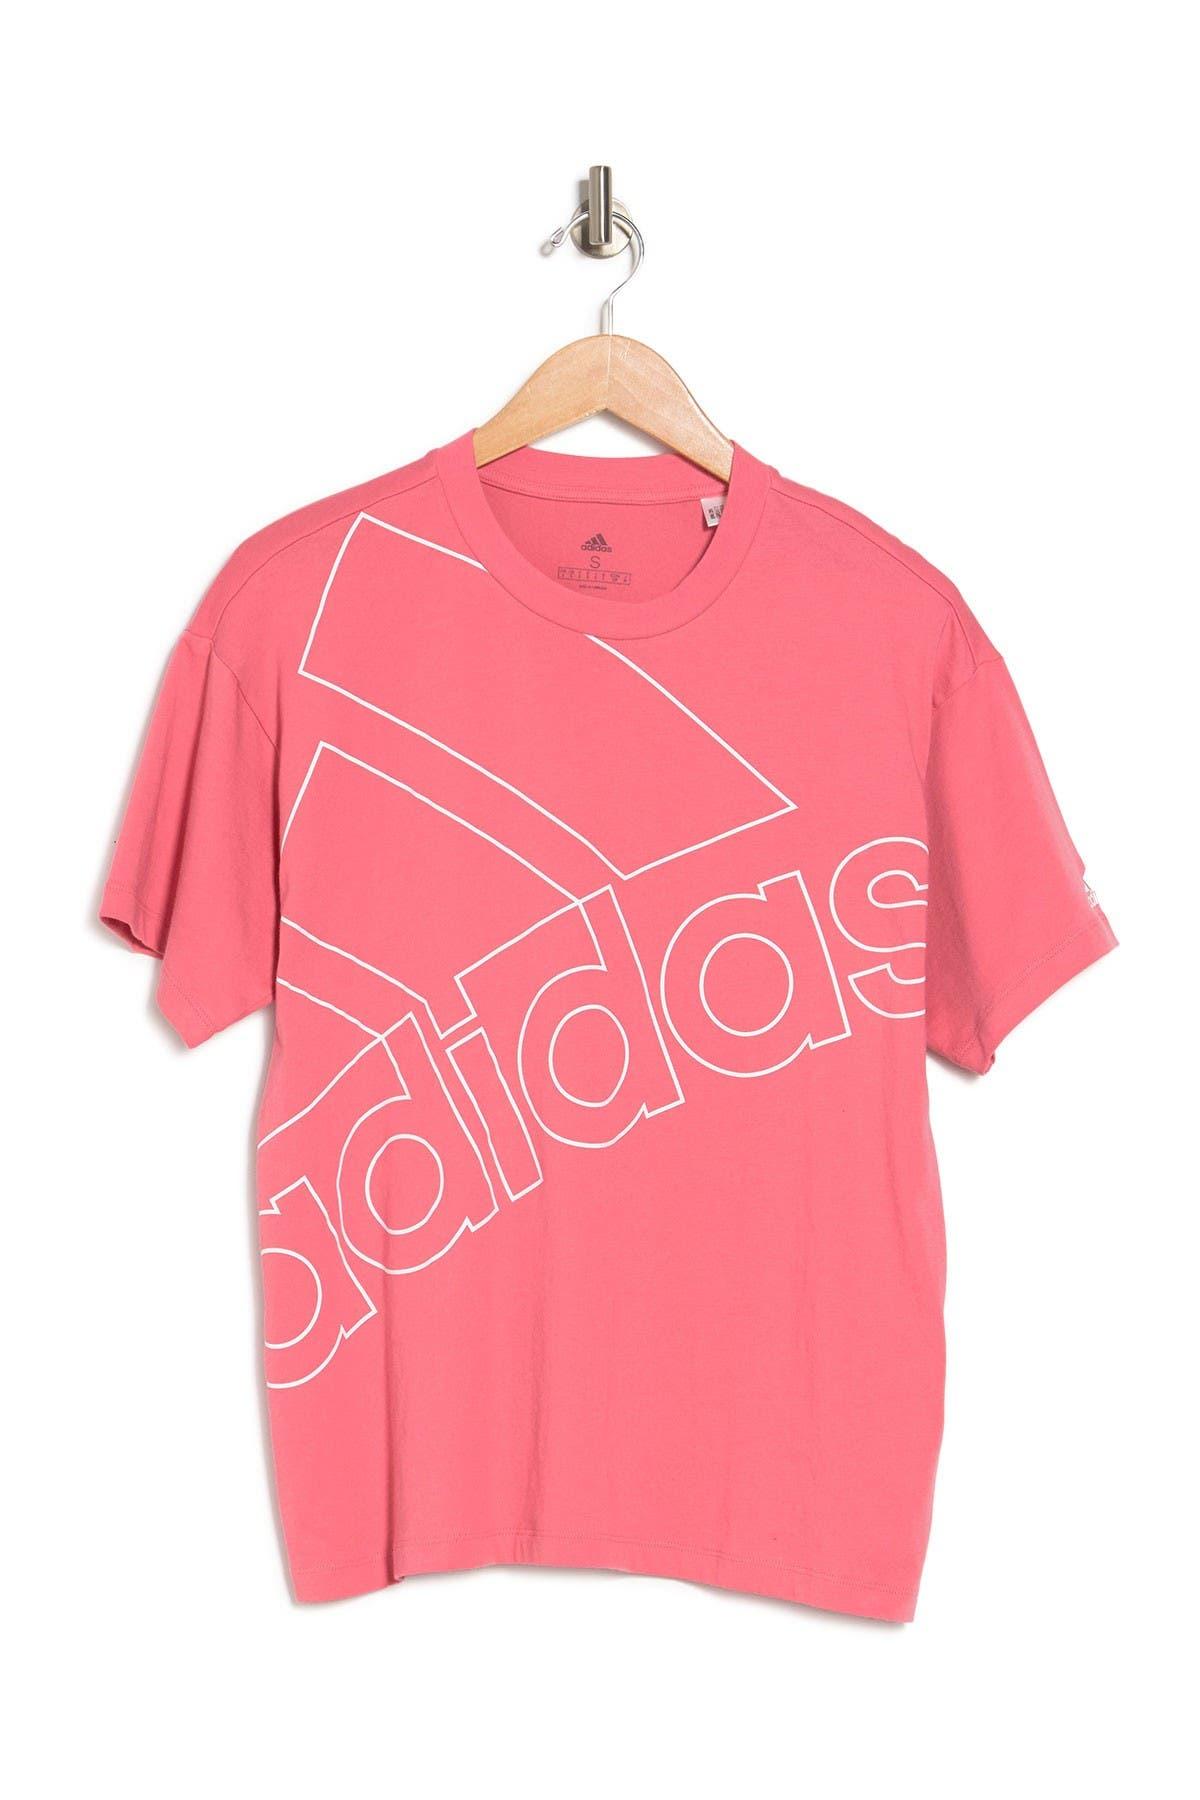 Image of adidas Favorite Q1 Cropped T-Shirt